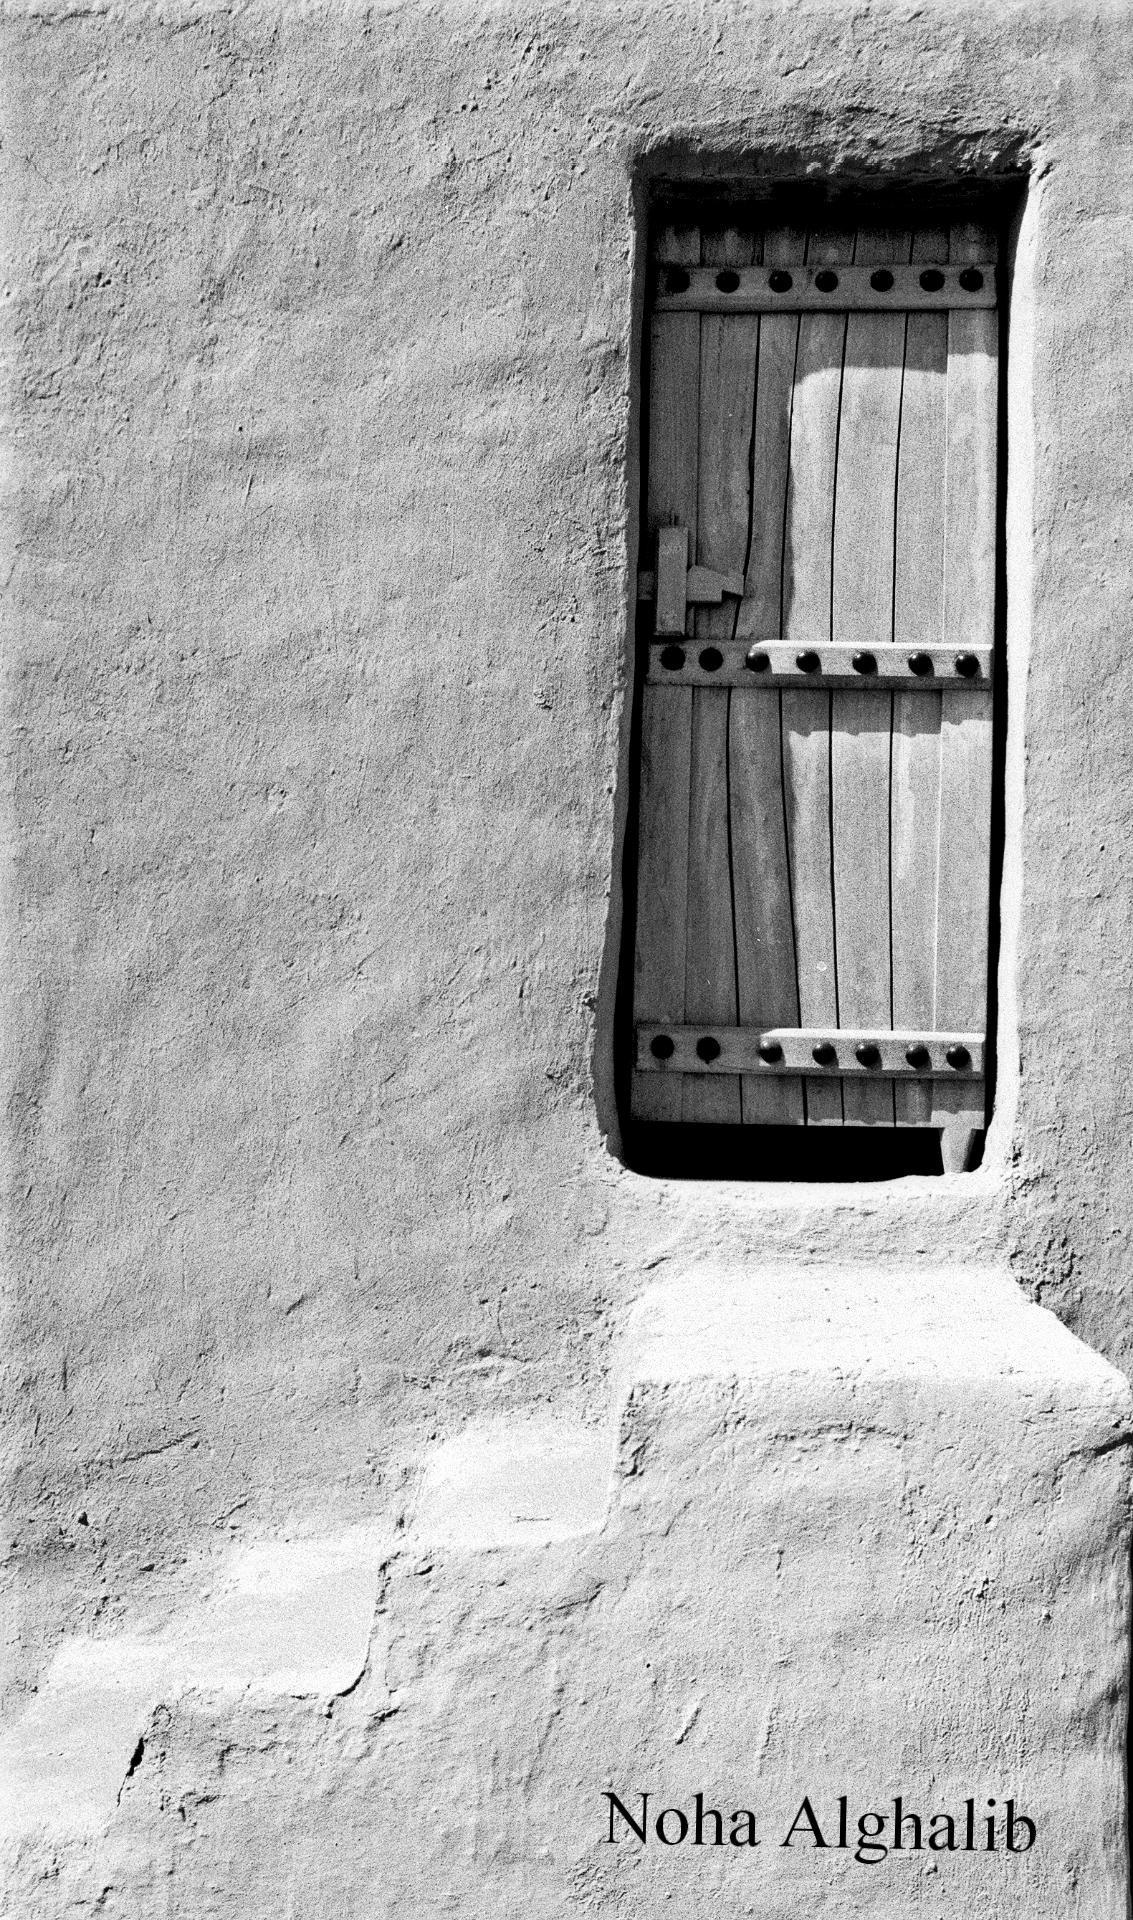 Door from AlQishlah in Hail